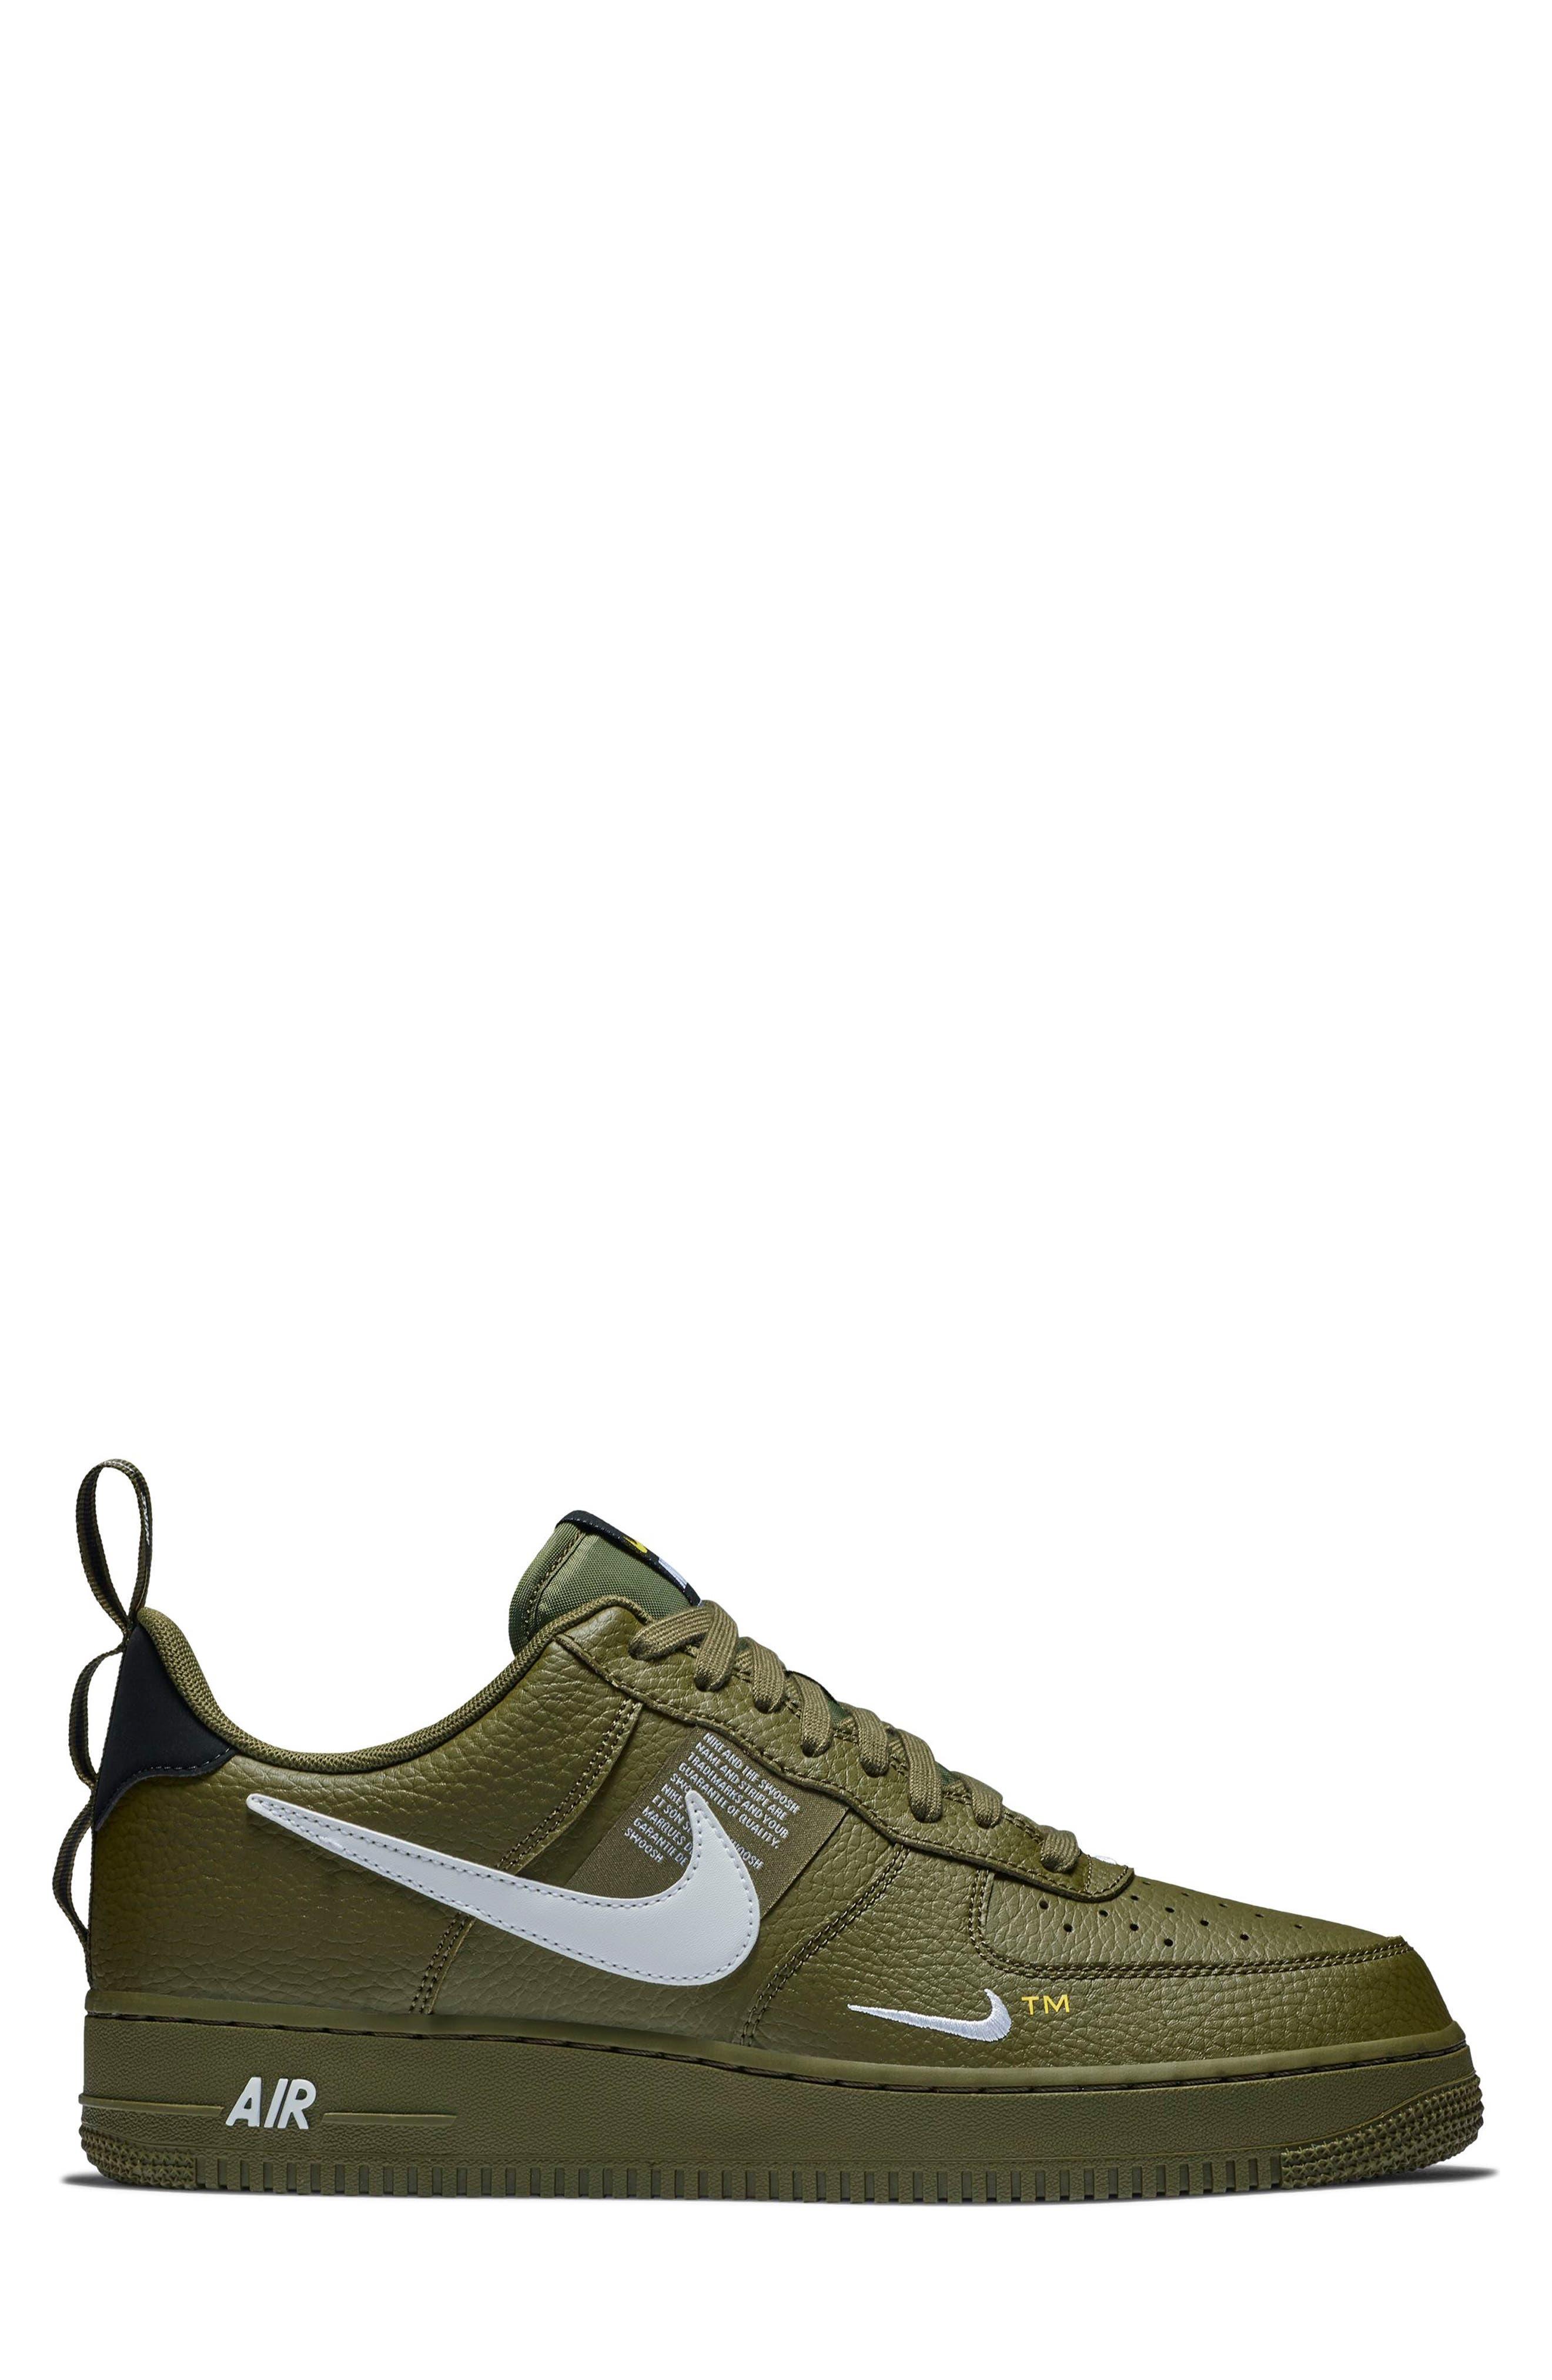 Air Force 1 '07 LV8 Utility Sneaker,                             Alternate thumbnail 3, color,                             300